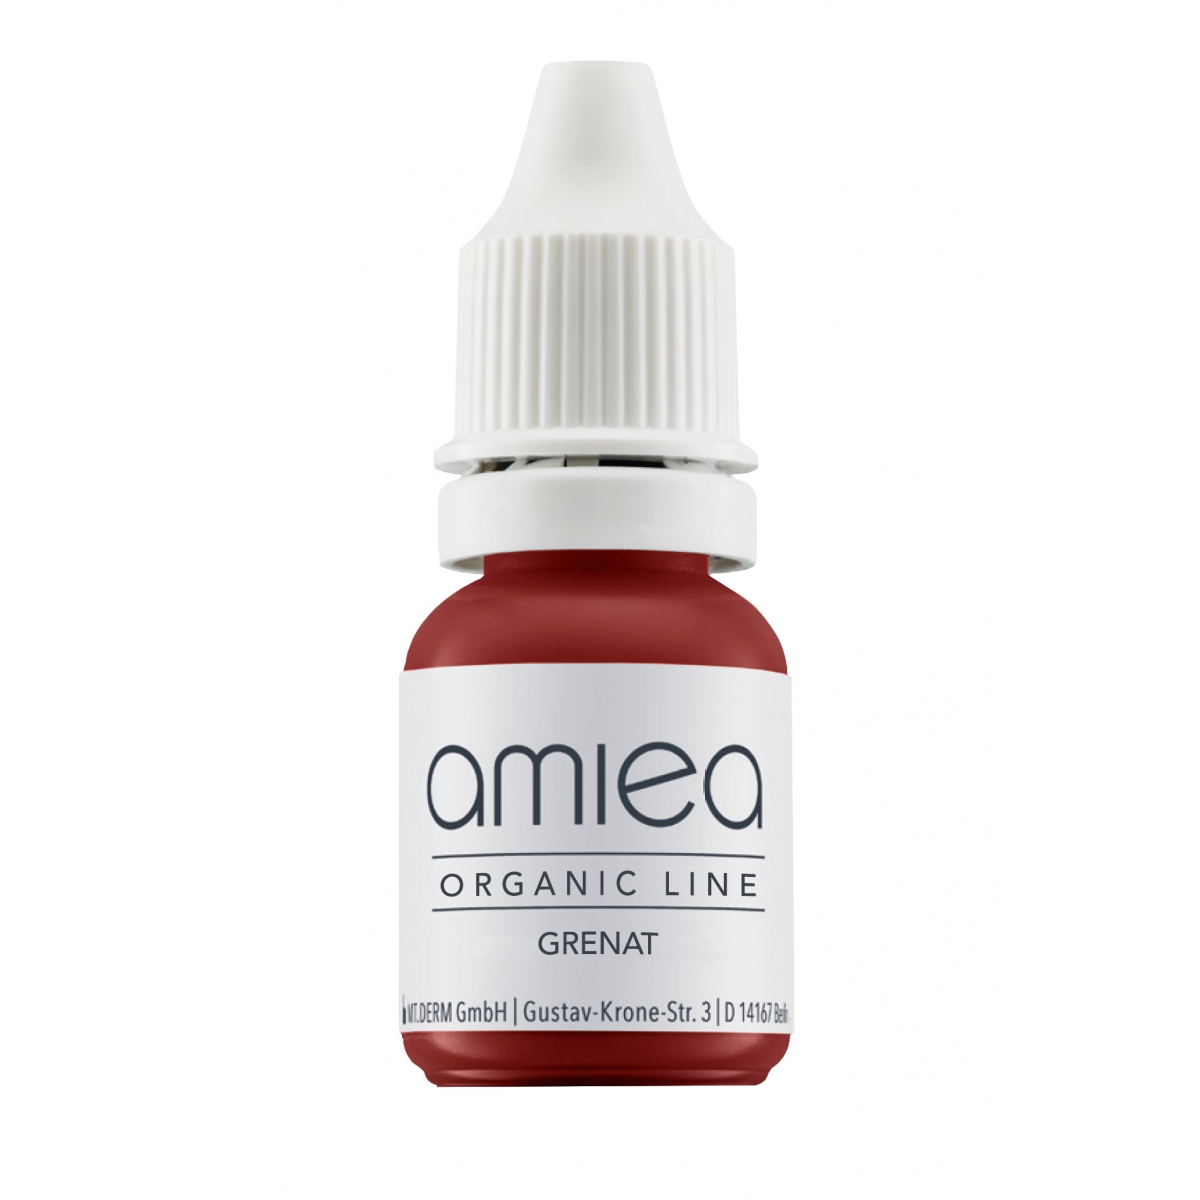 ORGANIC LINE (5ml)  - PIGMENT GRENAT ORGANICLINE AMIEA (5 ml)